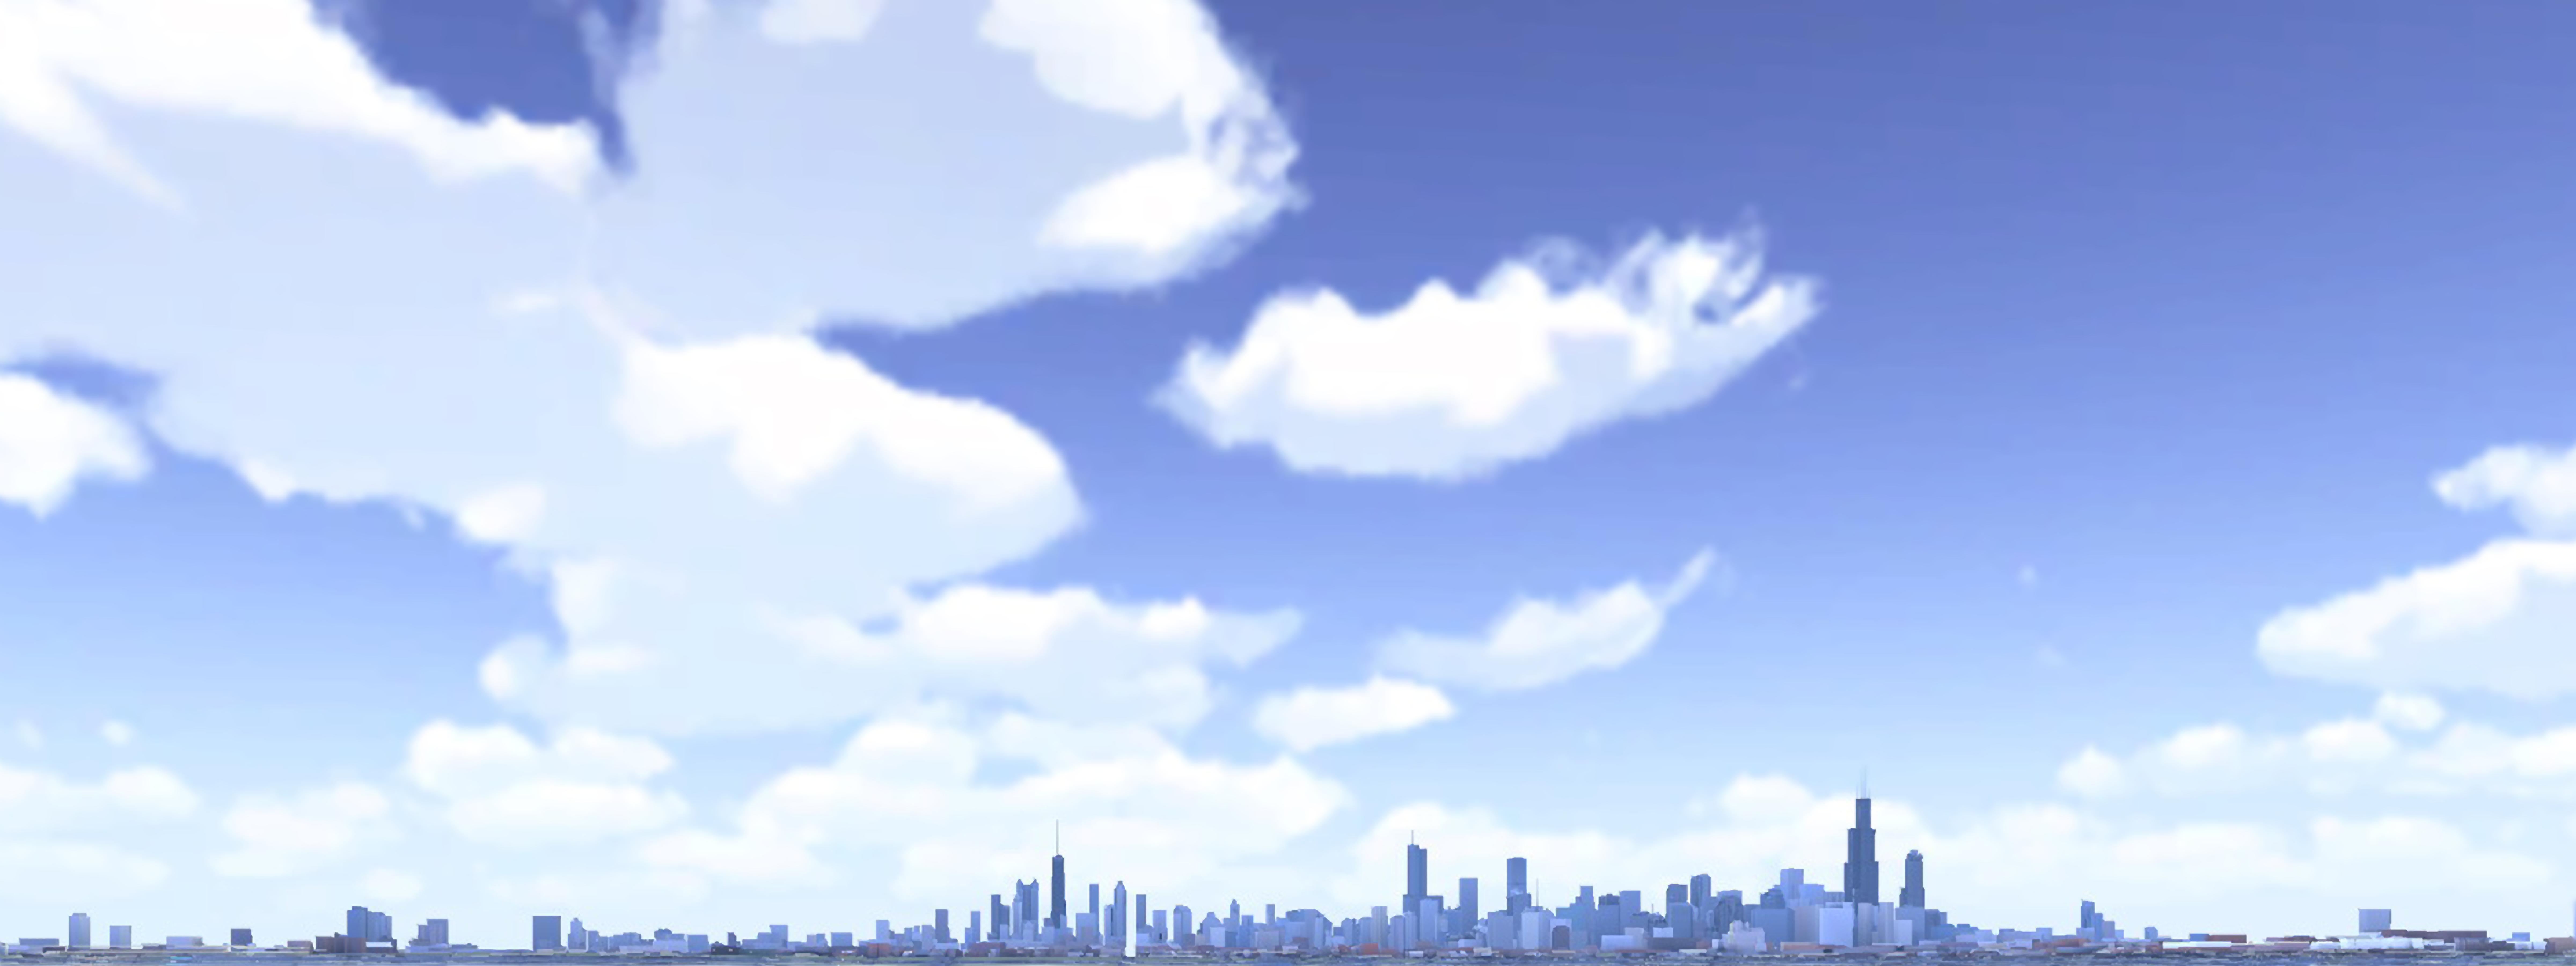 3D Map skyline